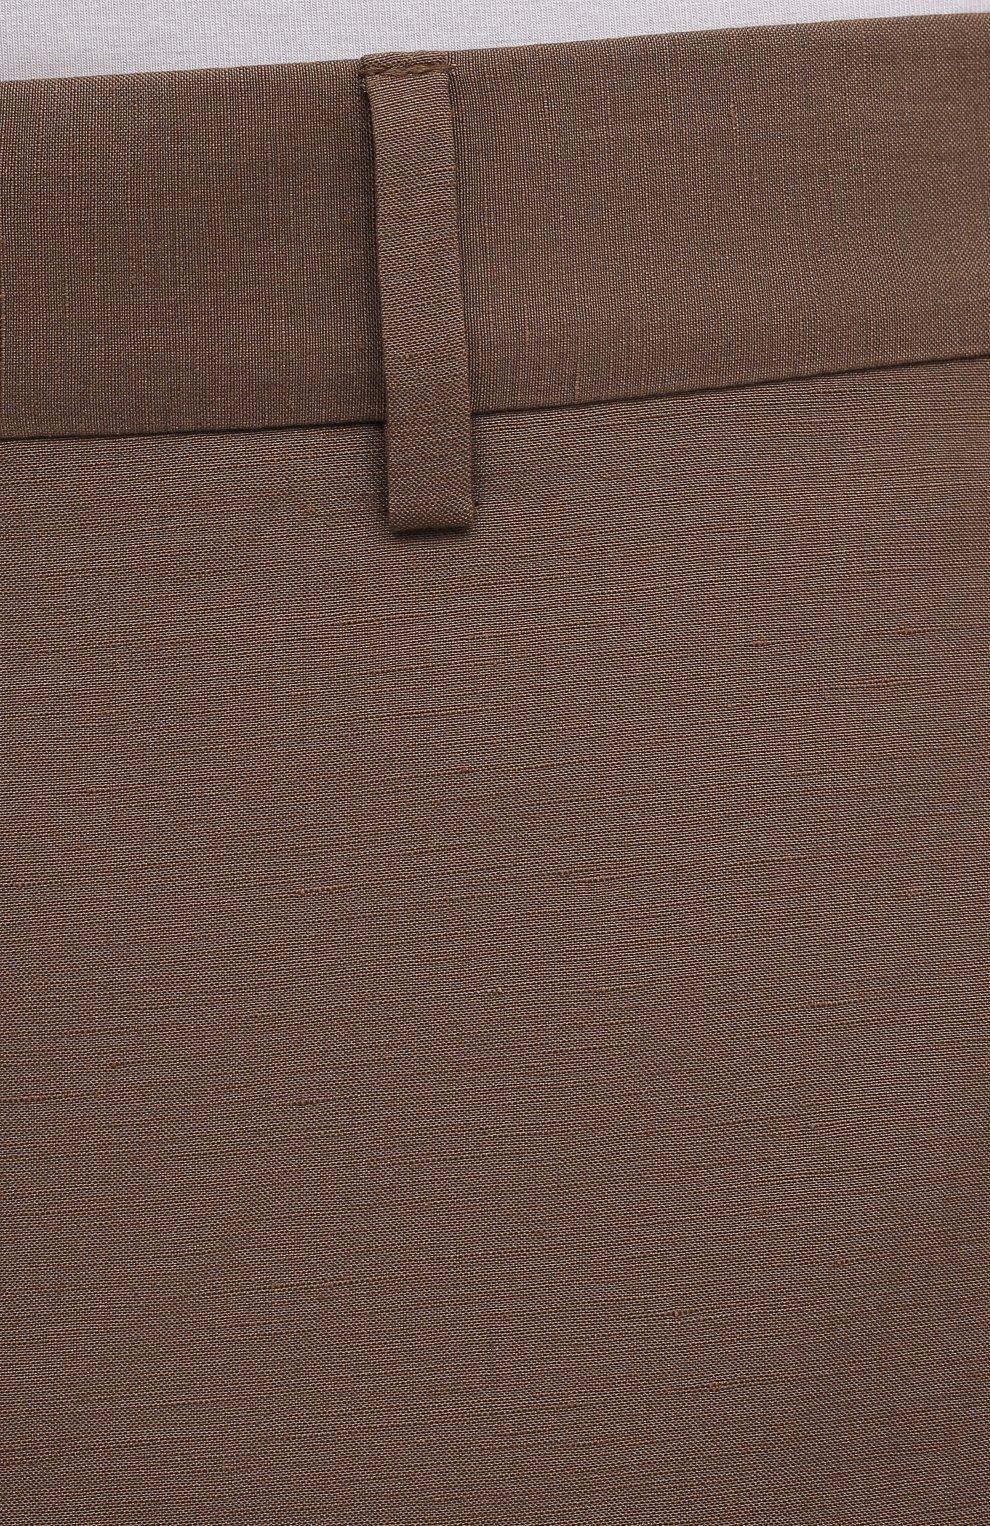 Мужские брюки из шелка и льна TOM FORD коричневого цвета, арт. 976R15/759242   Фото 5